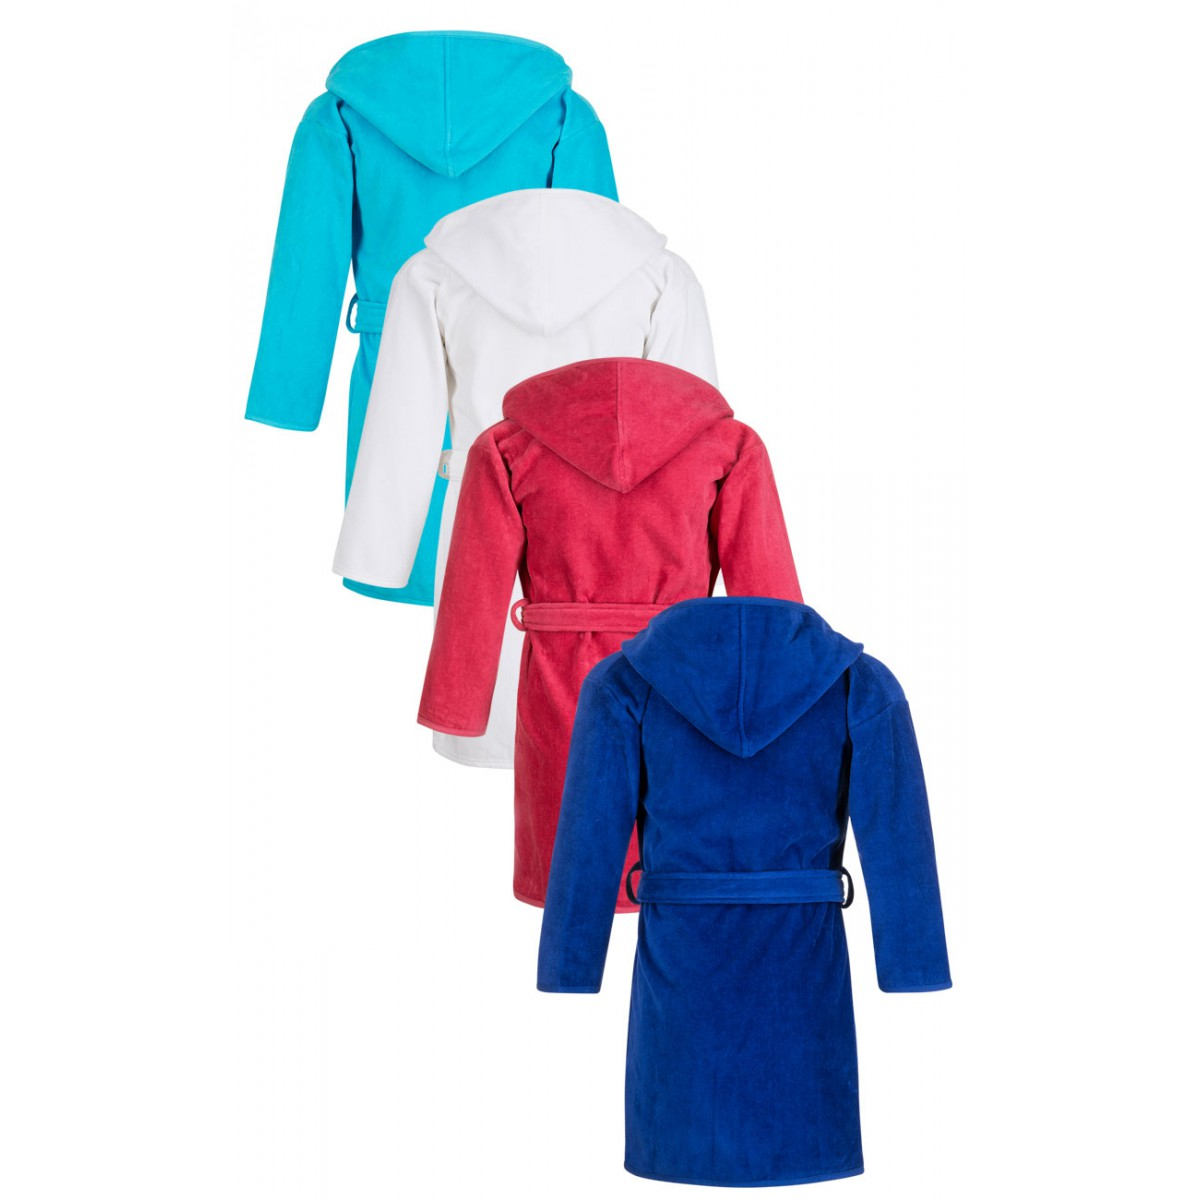 Gekleurde kinderbadjassen